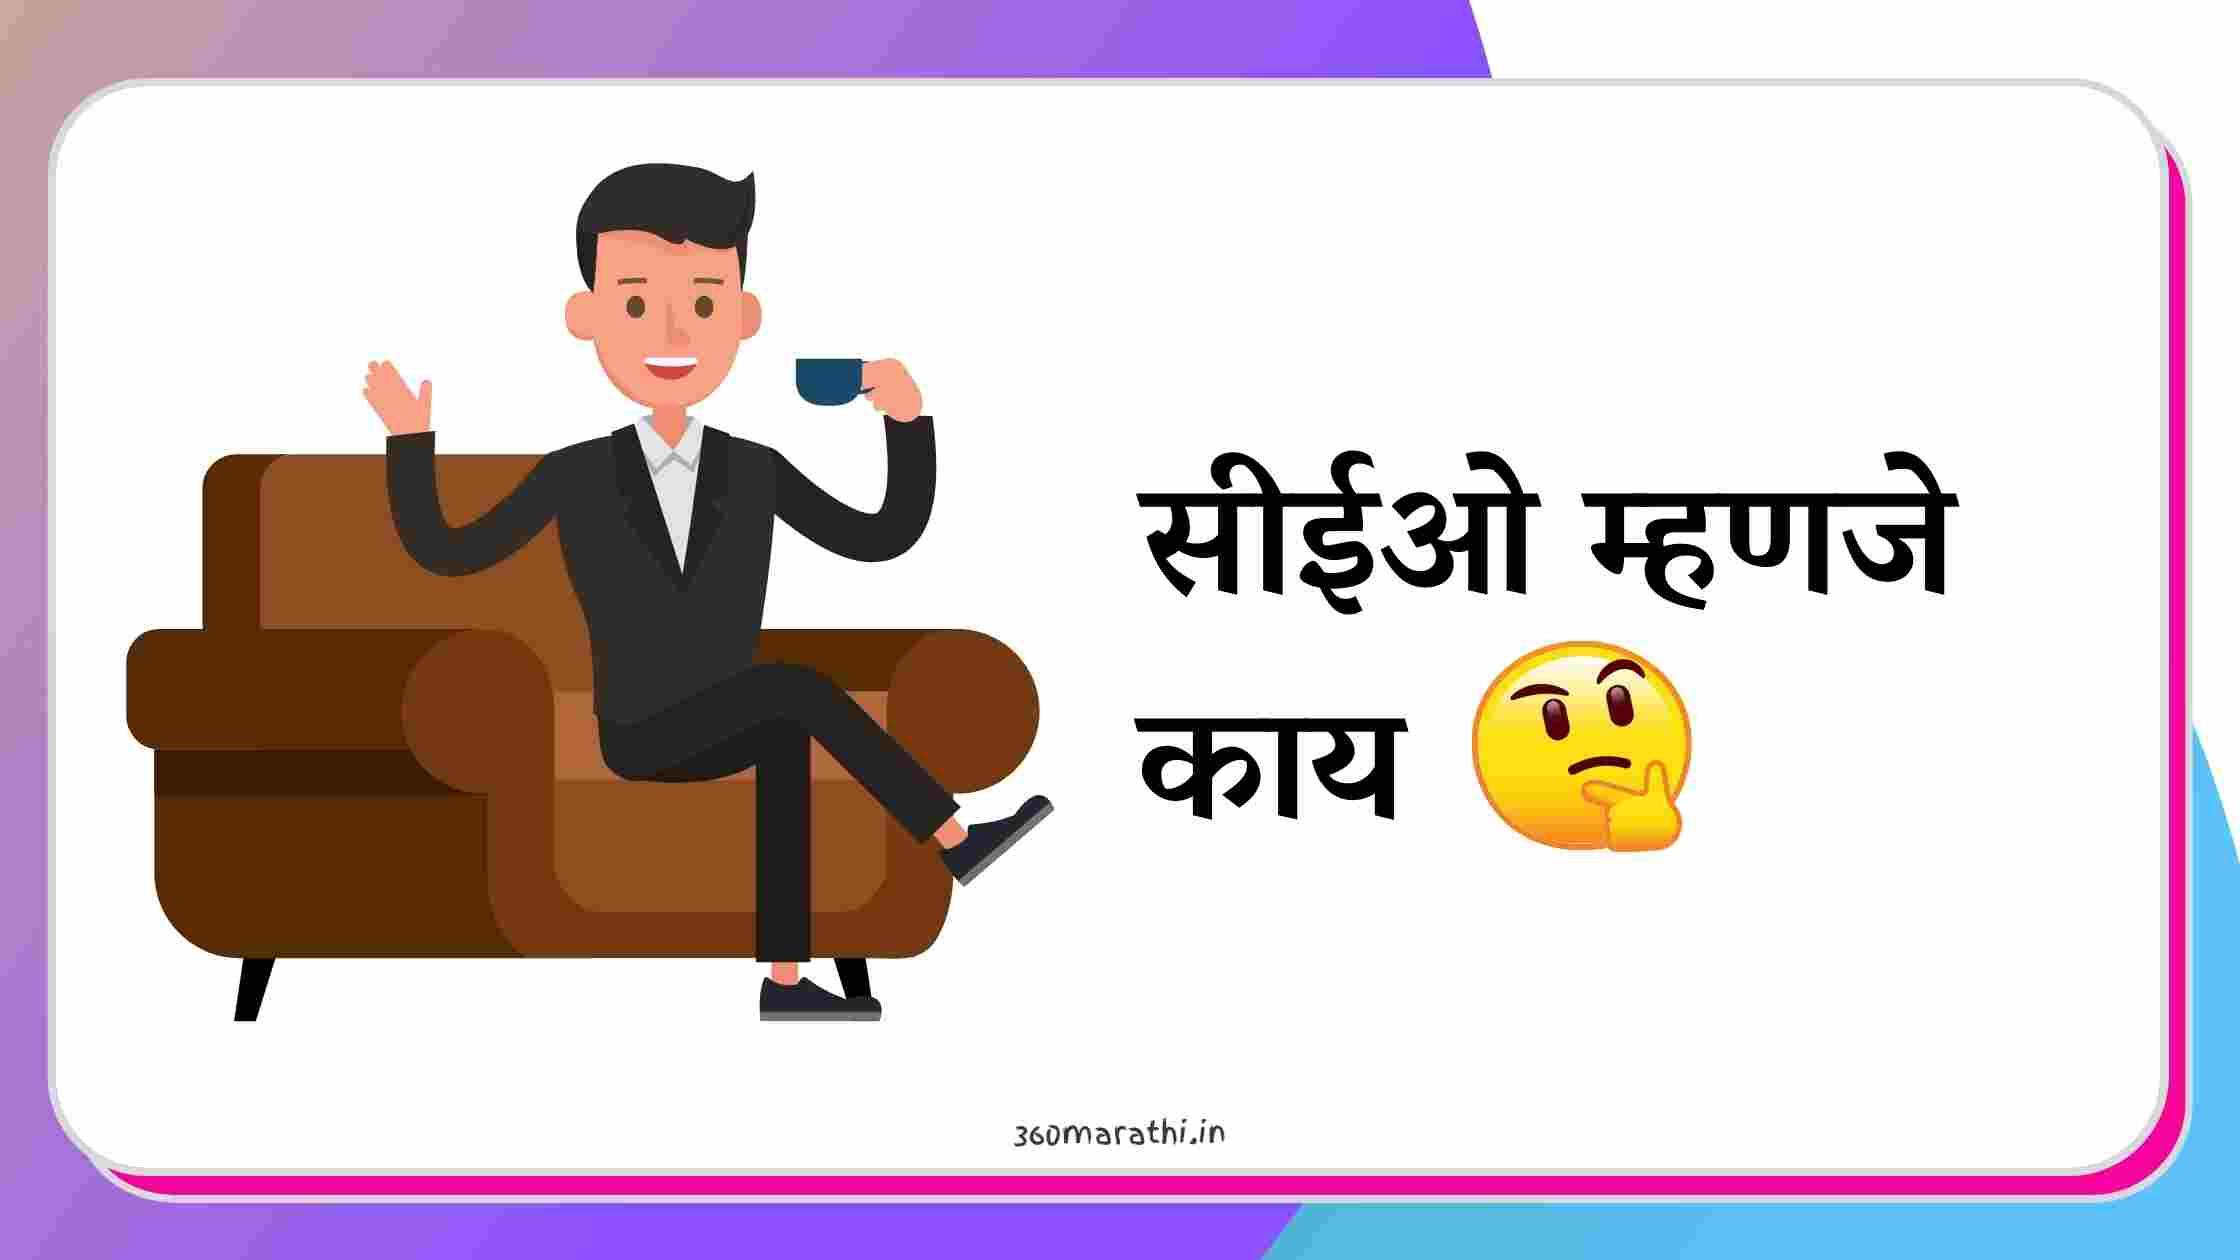 सीईओ म्हणजे काय   CEO Information in Marathi